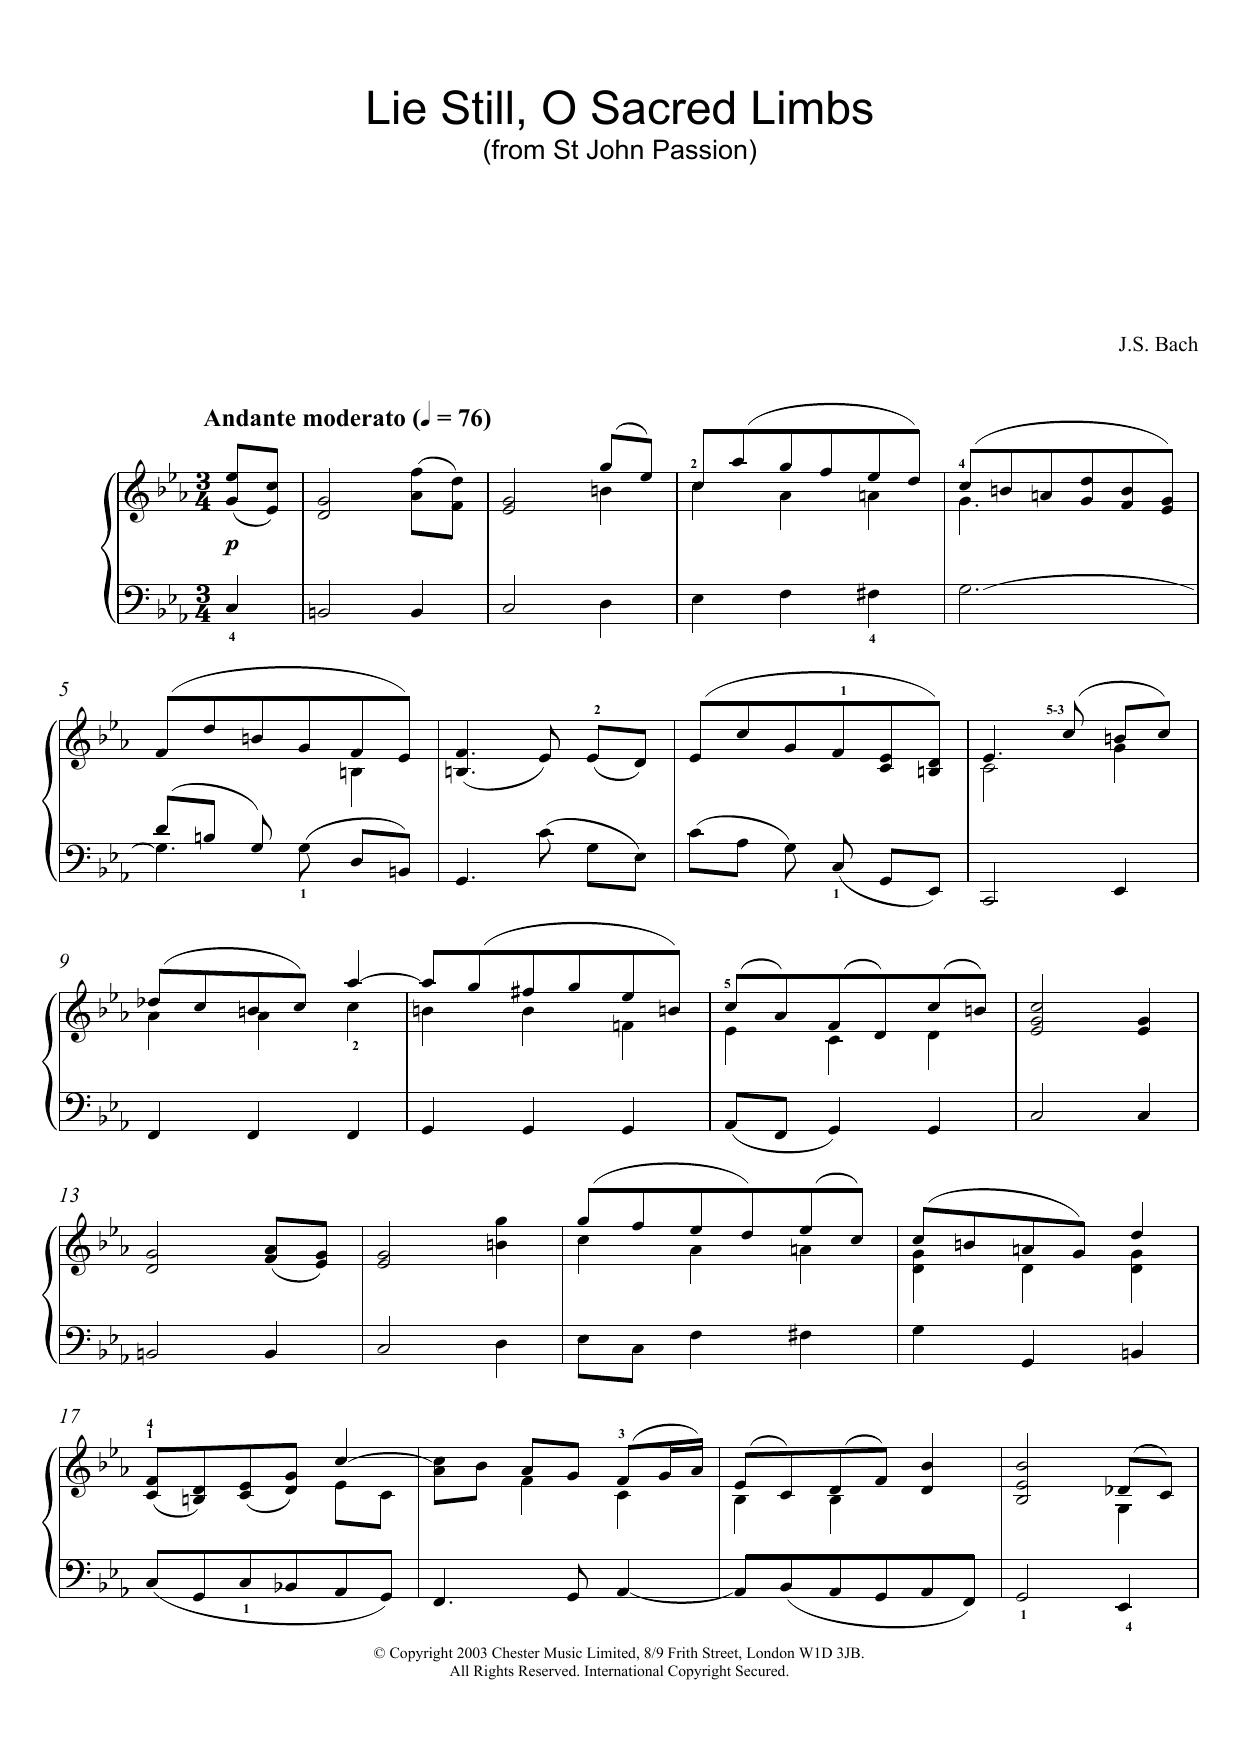 Lie Still, O Sacred Limbs (from St John Passion) sheet music